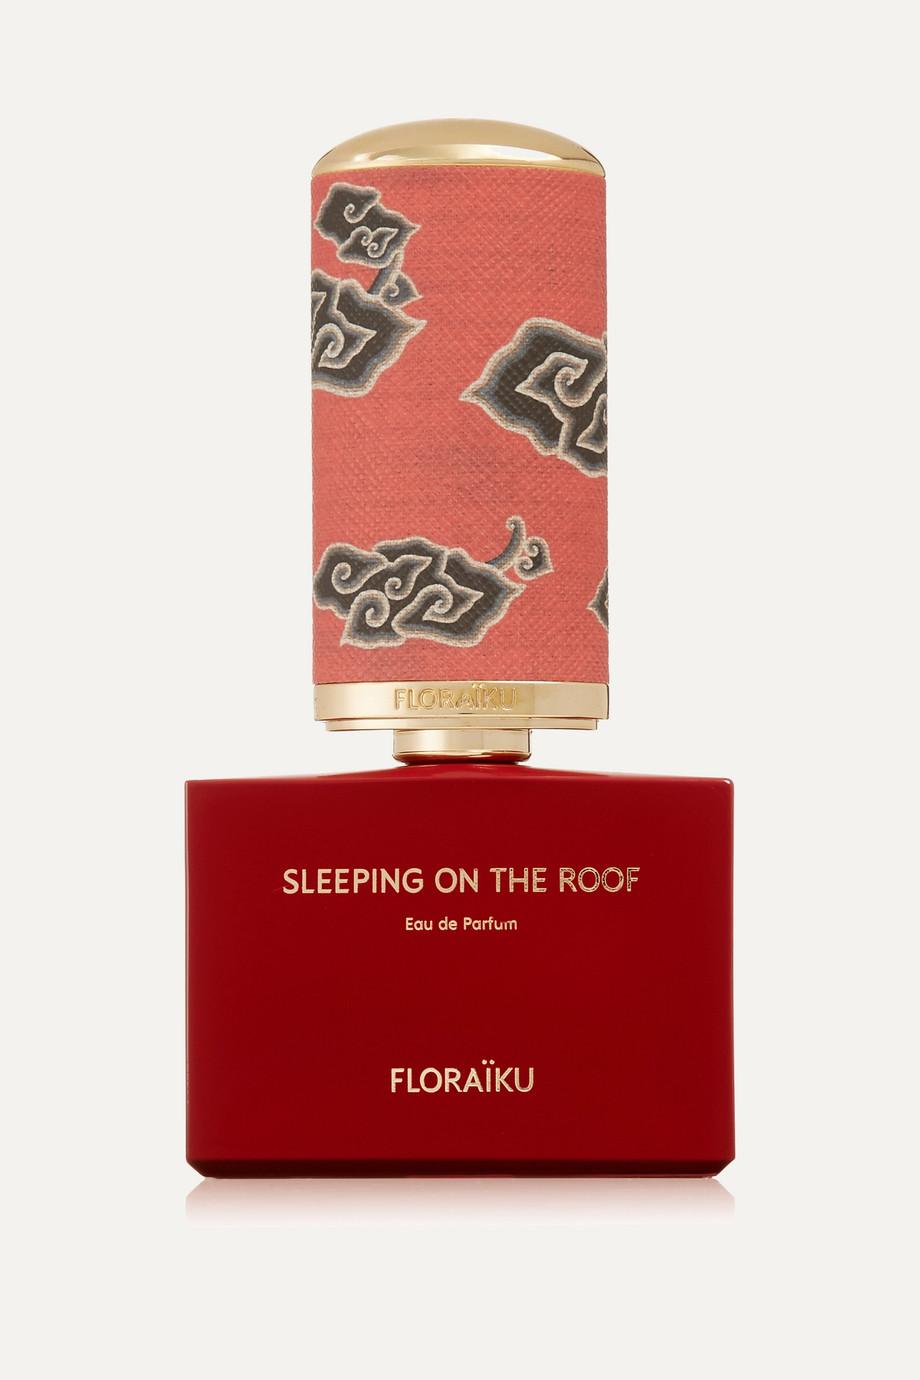 Floraiku Sleeping on the Roof Eau de Parfum Set